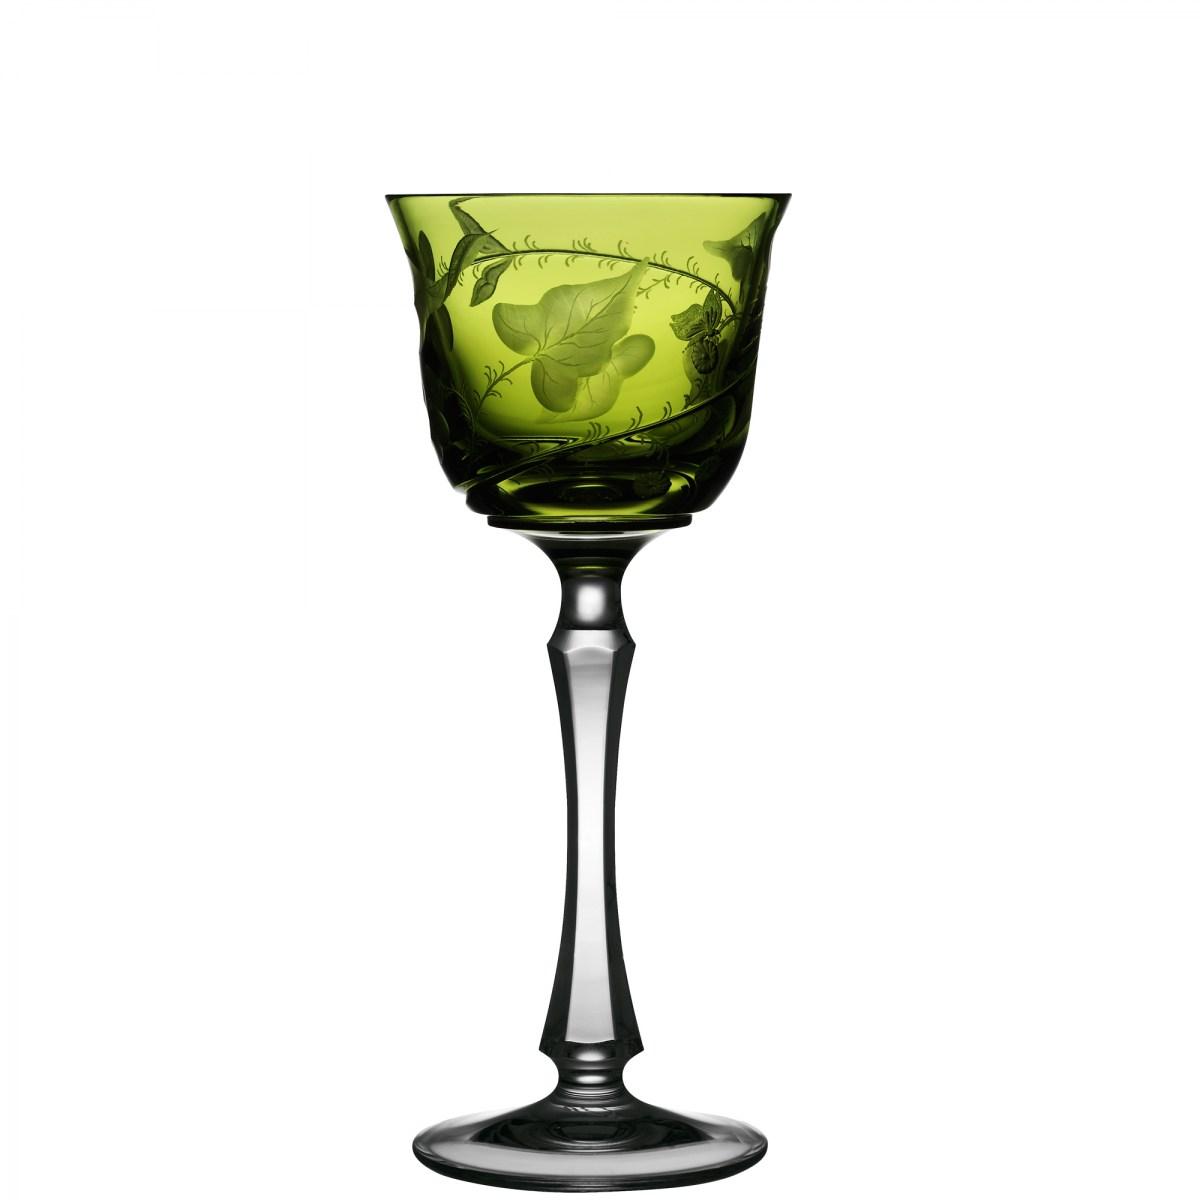 Rain Forest Yellow-Green Wine - $ 239 / € 209